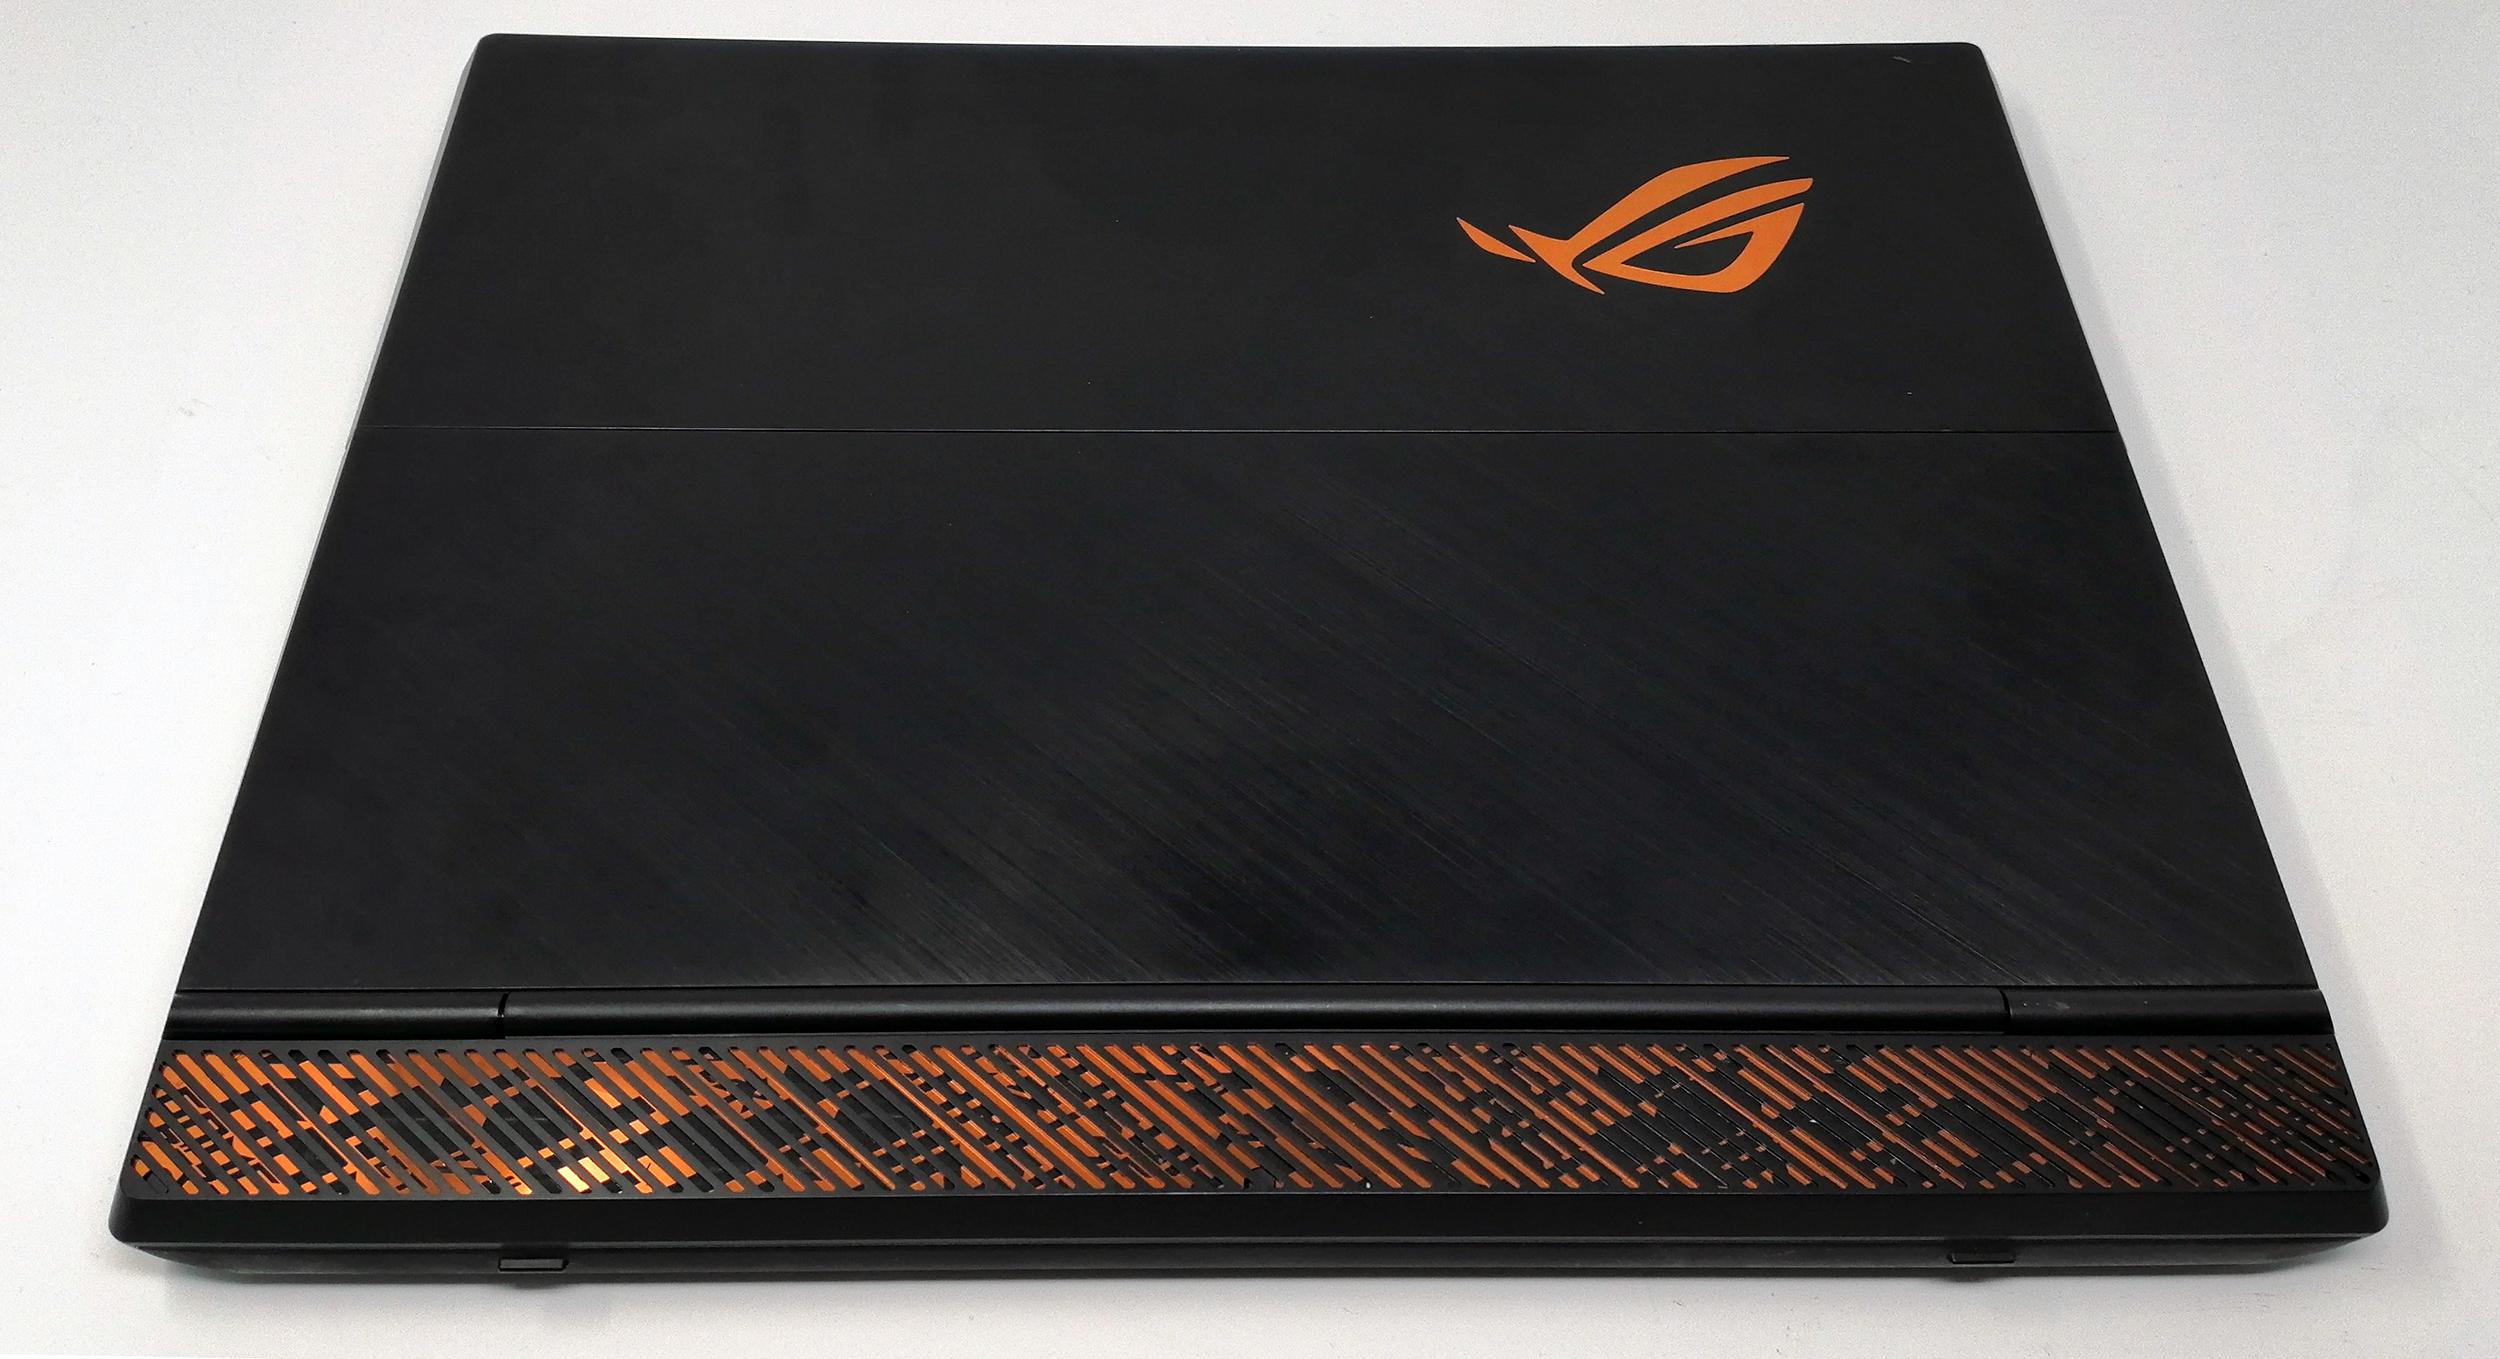 Asus Rog Mothership Gz700gx 17 3 Inch G Sync Gaming Laptop